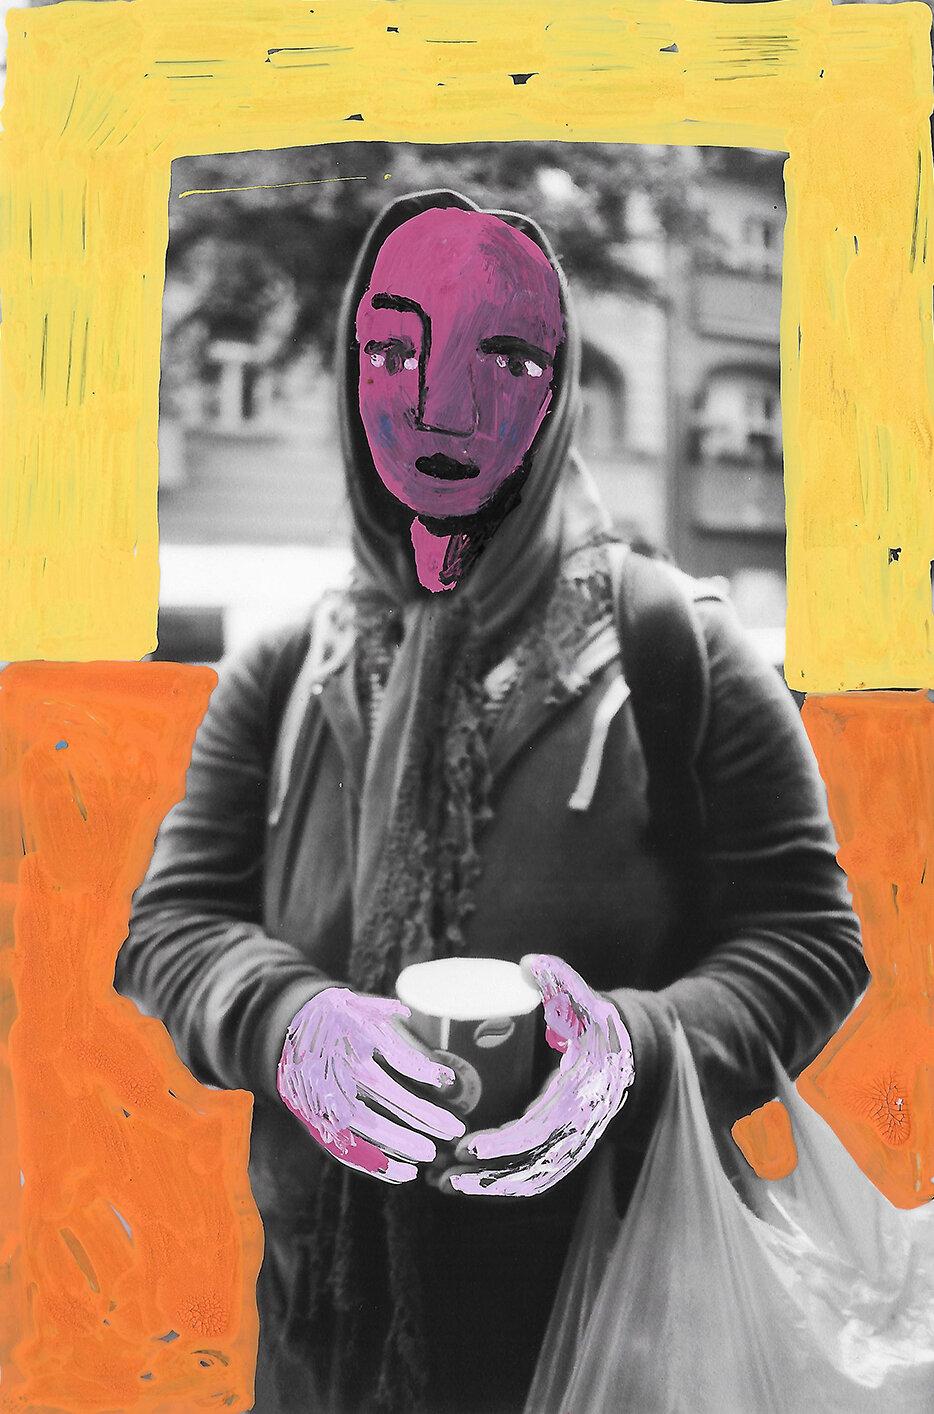 'Reframing Change' 2019, Berlin, Inkjet photograph & Acrylic, 10x15cm